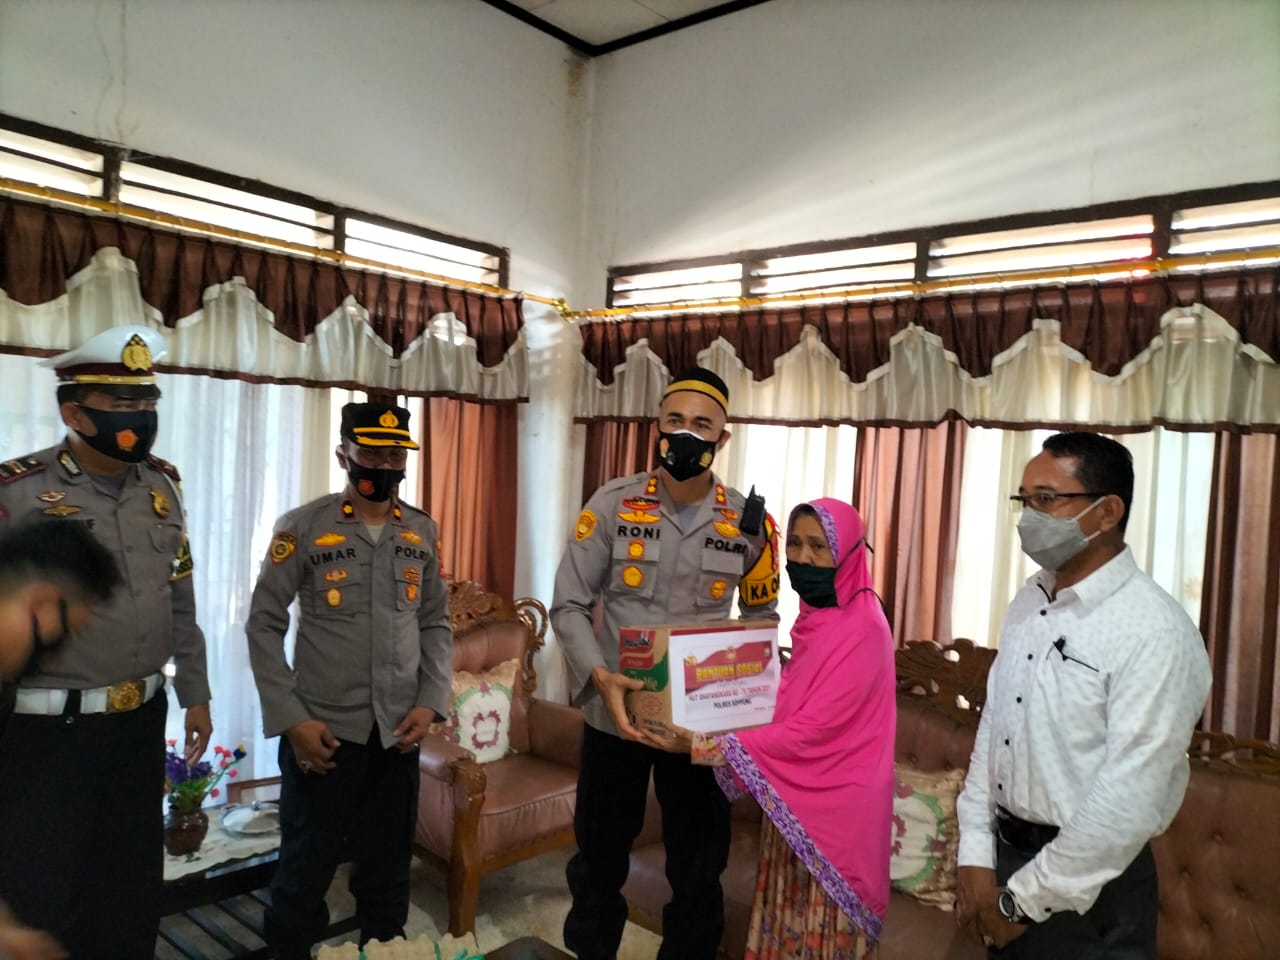 Sambut HUT Bhayangkara Ke 75, Kapolres Soppeng di Dampingi Kabag SDM dan Kasatlantas Menggelar Baksos